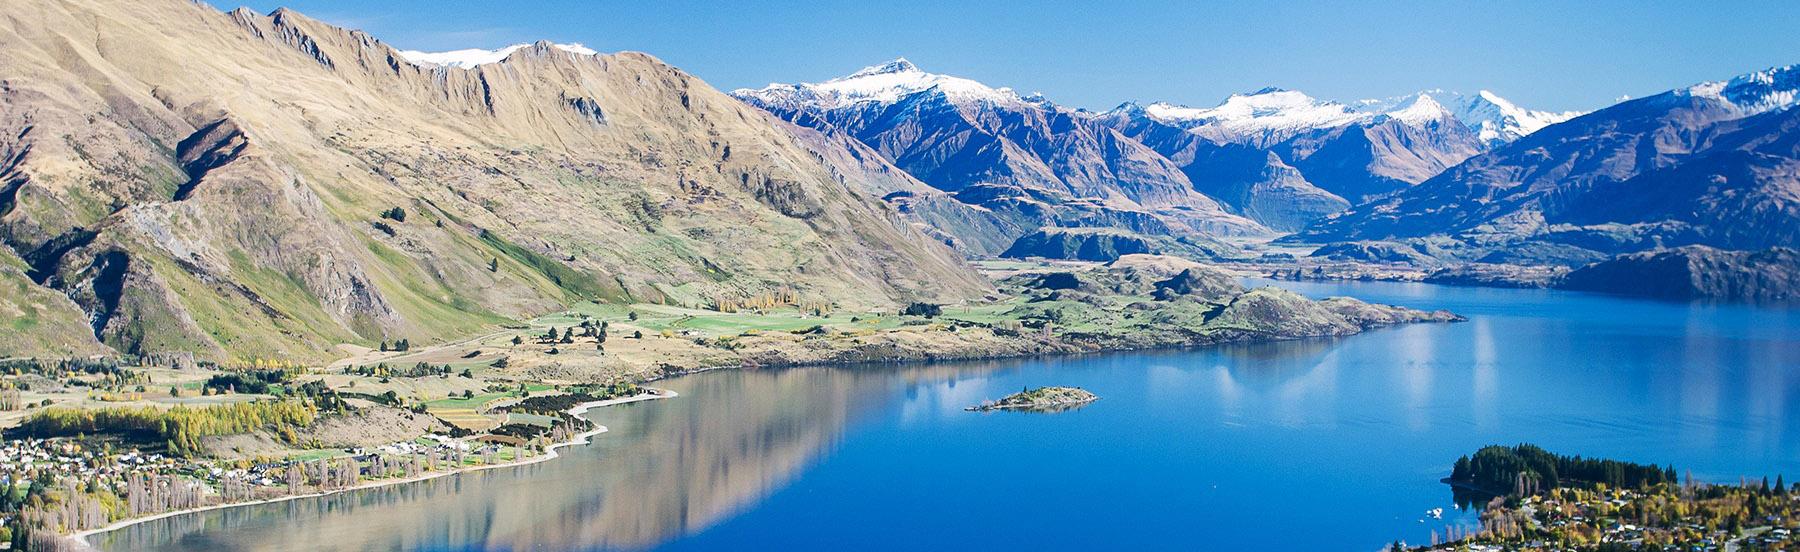 Luxury-travel-destination-wanaka-new-zealand-wanaka-lake